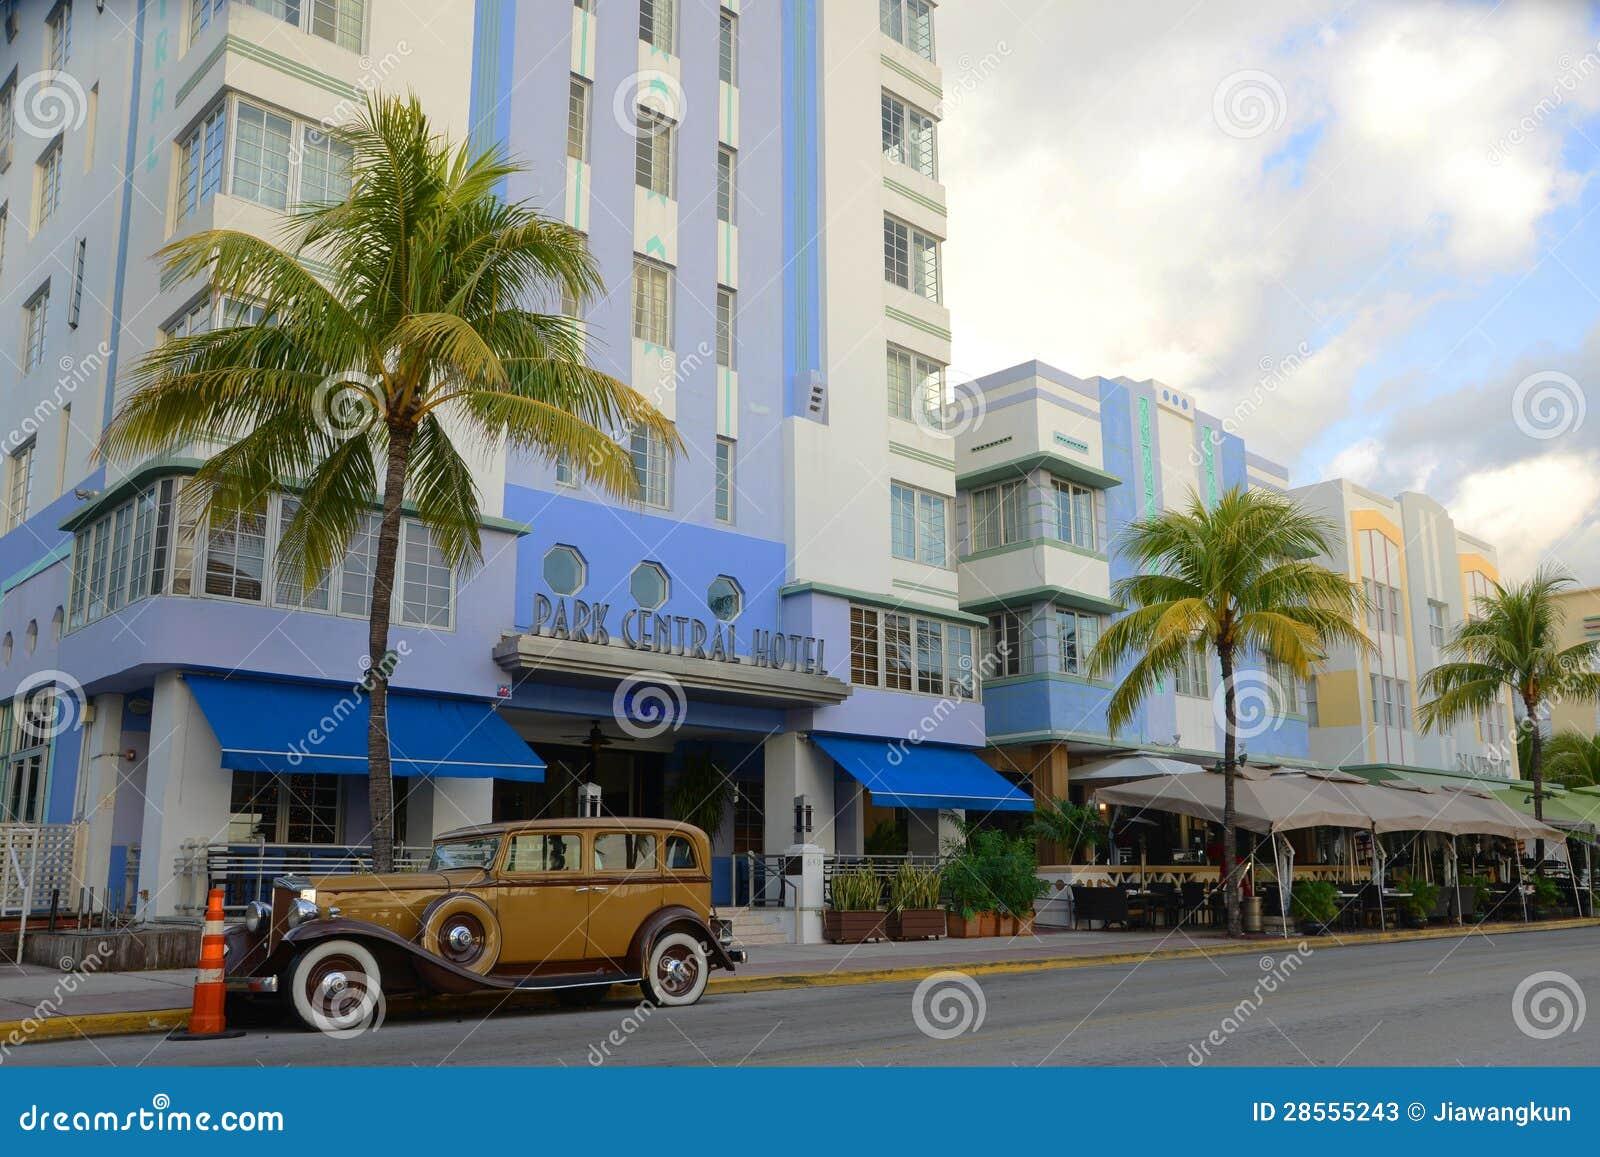 Art Deco Miami South Beach History